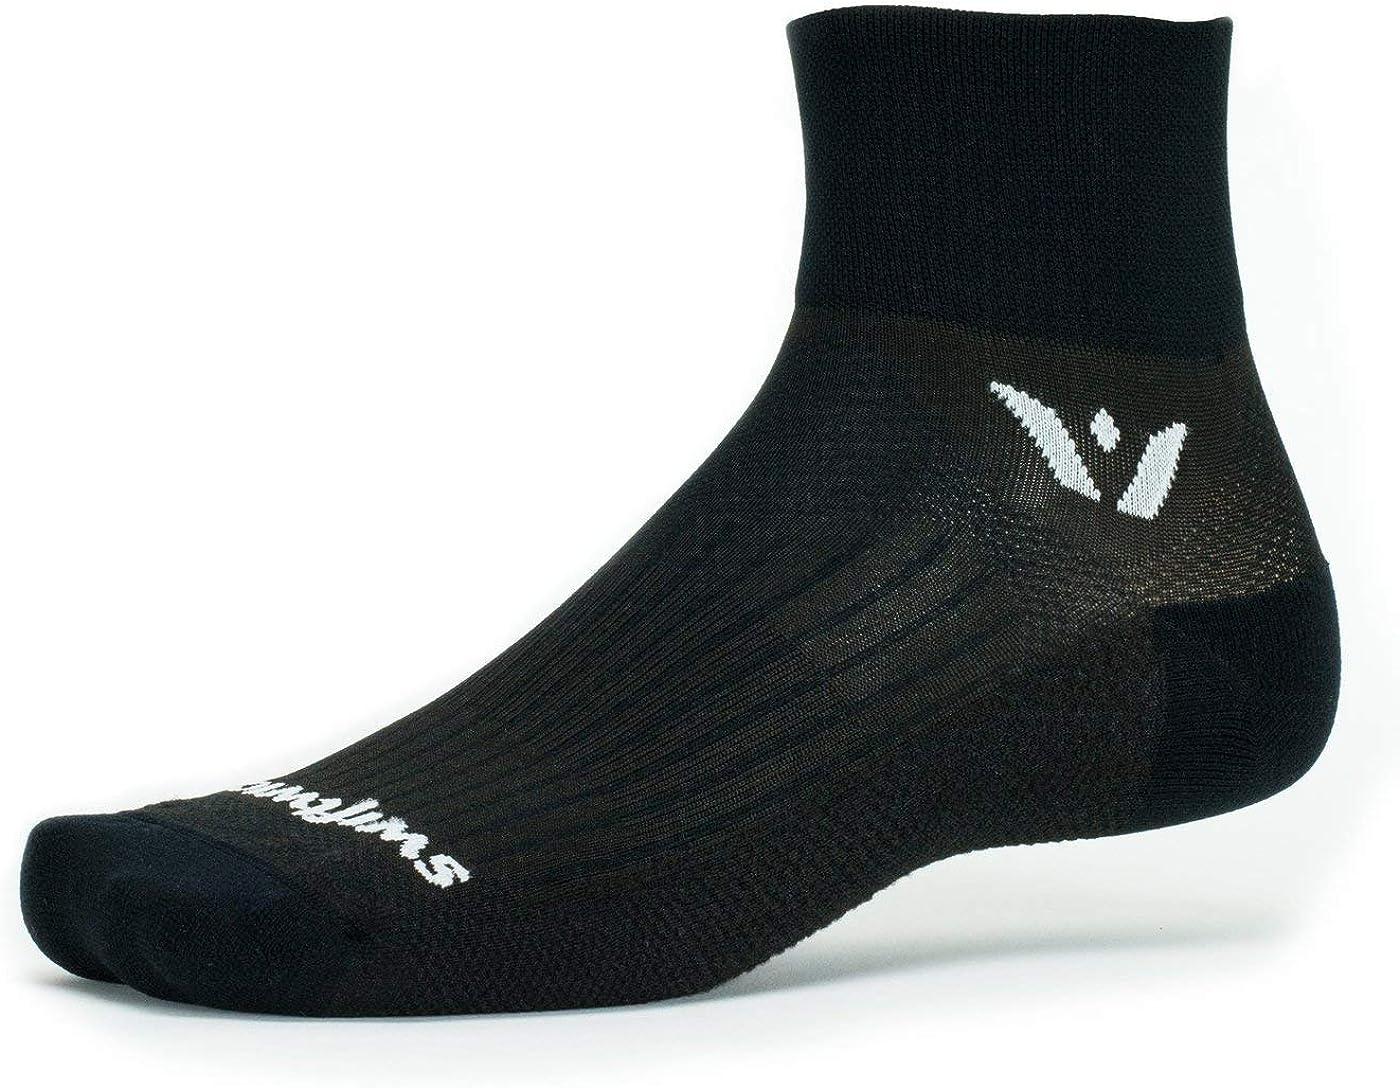 Swiftwick- PERFORMANCE TWO Running & Cycling Socks, Fast Dry, Cushion Crew Socks